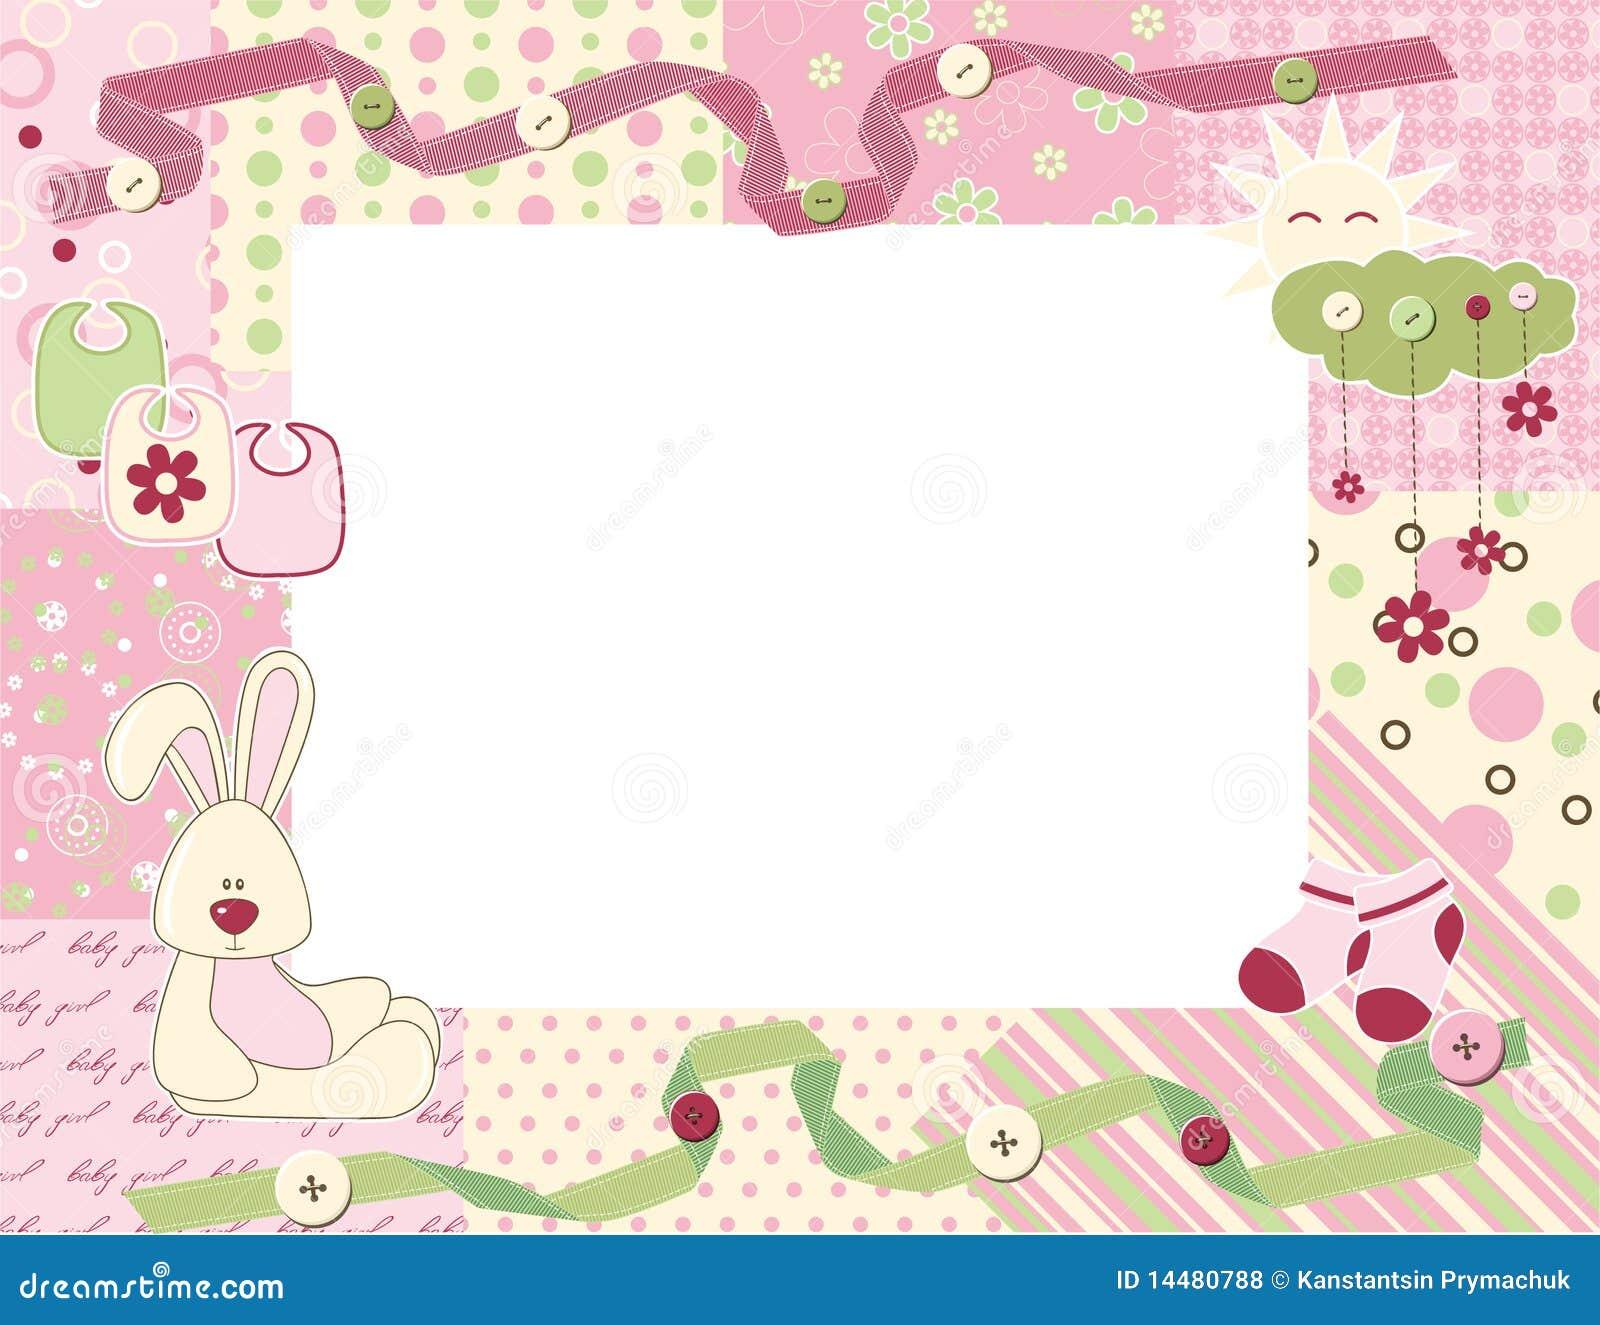 cadre de photo d 39 enfant illustration de vecteur illustration du trame 14480788. Black Bedroom Furniture Sets. Home Design Ideas